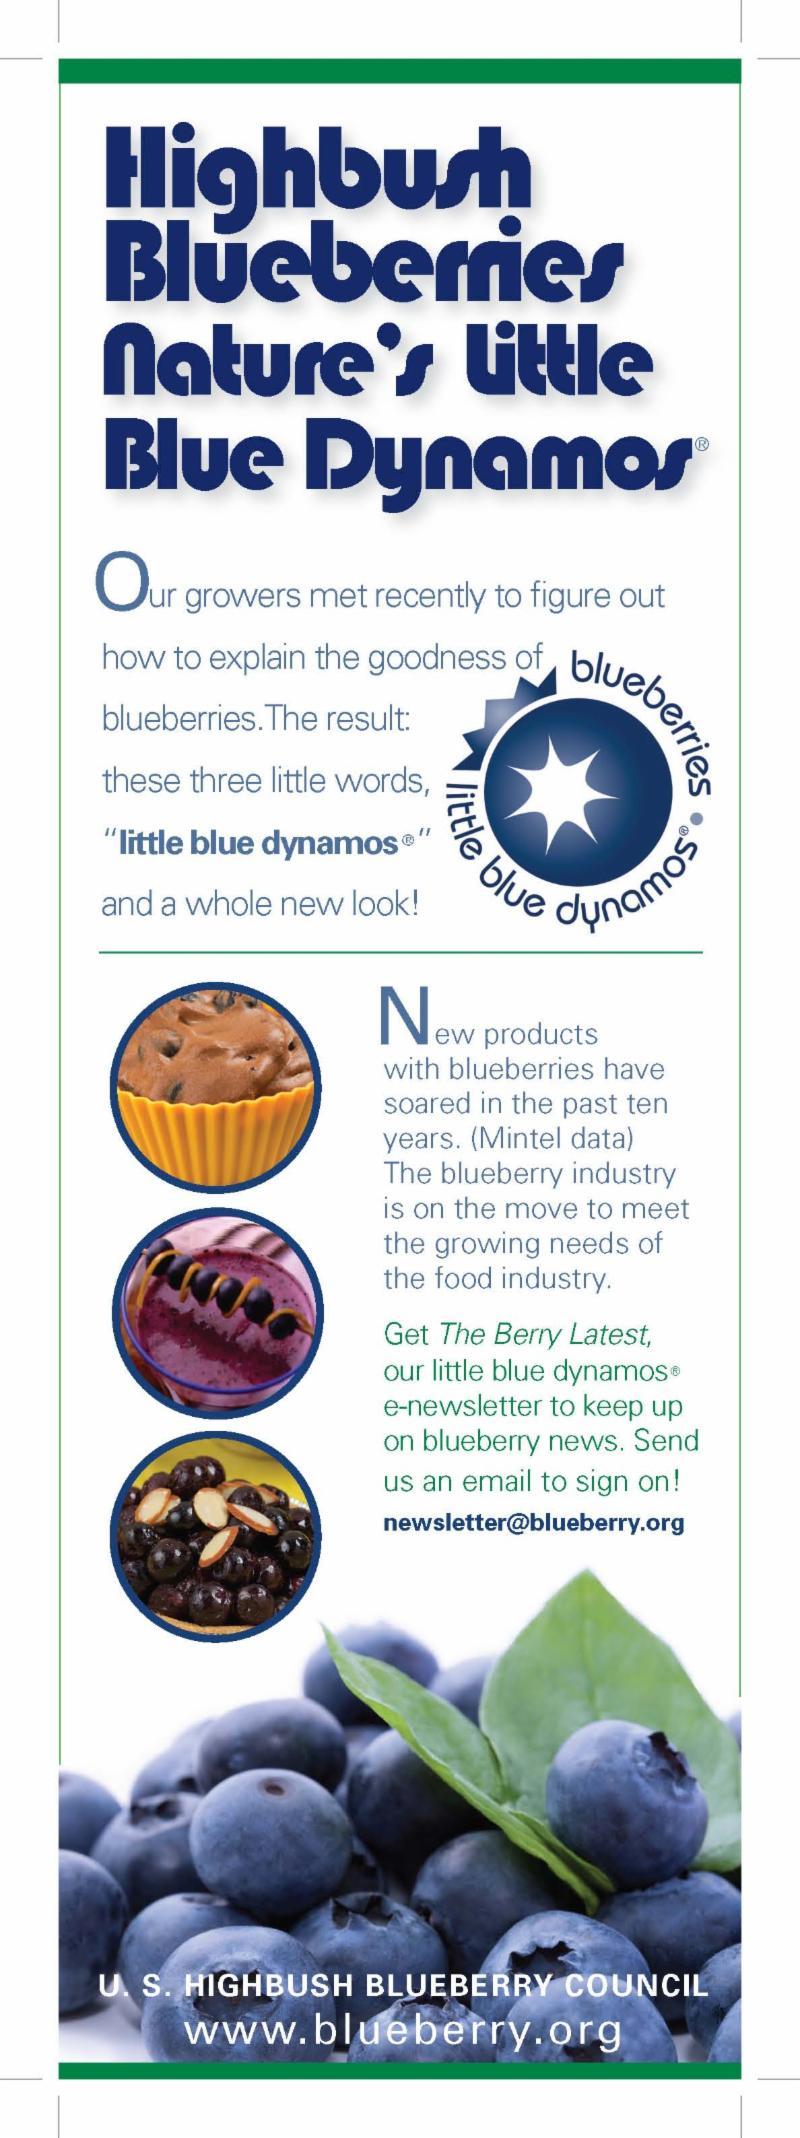 Highbush Blueberry Council